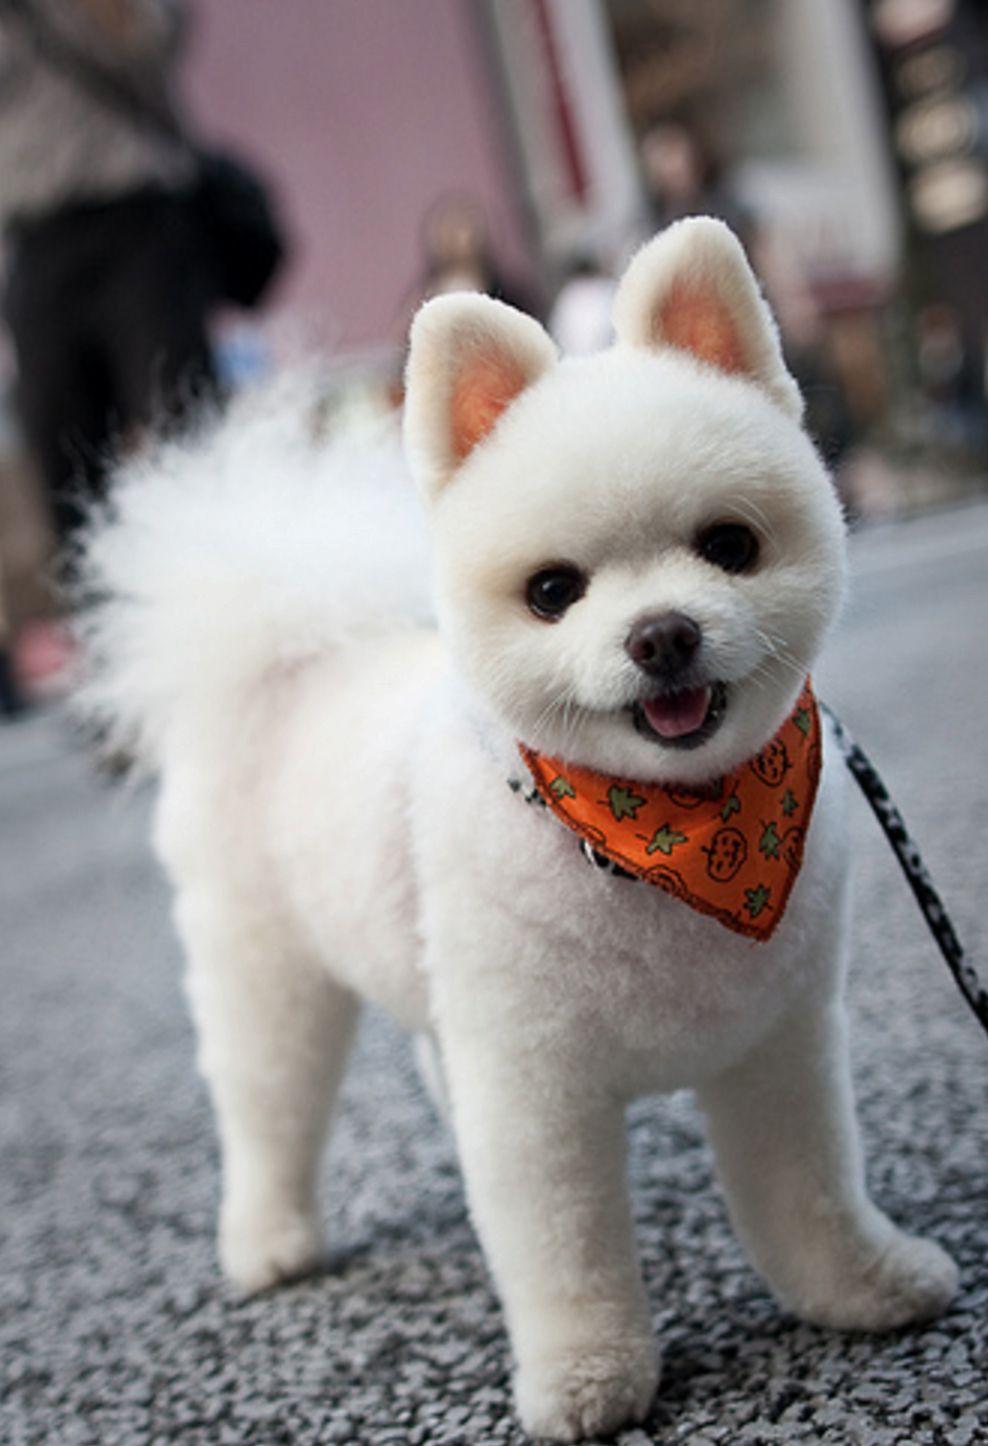 Pomeranian With A Shiba Inu Haircut Too Cute For Words Cute